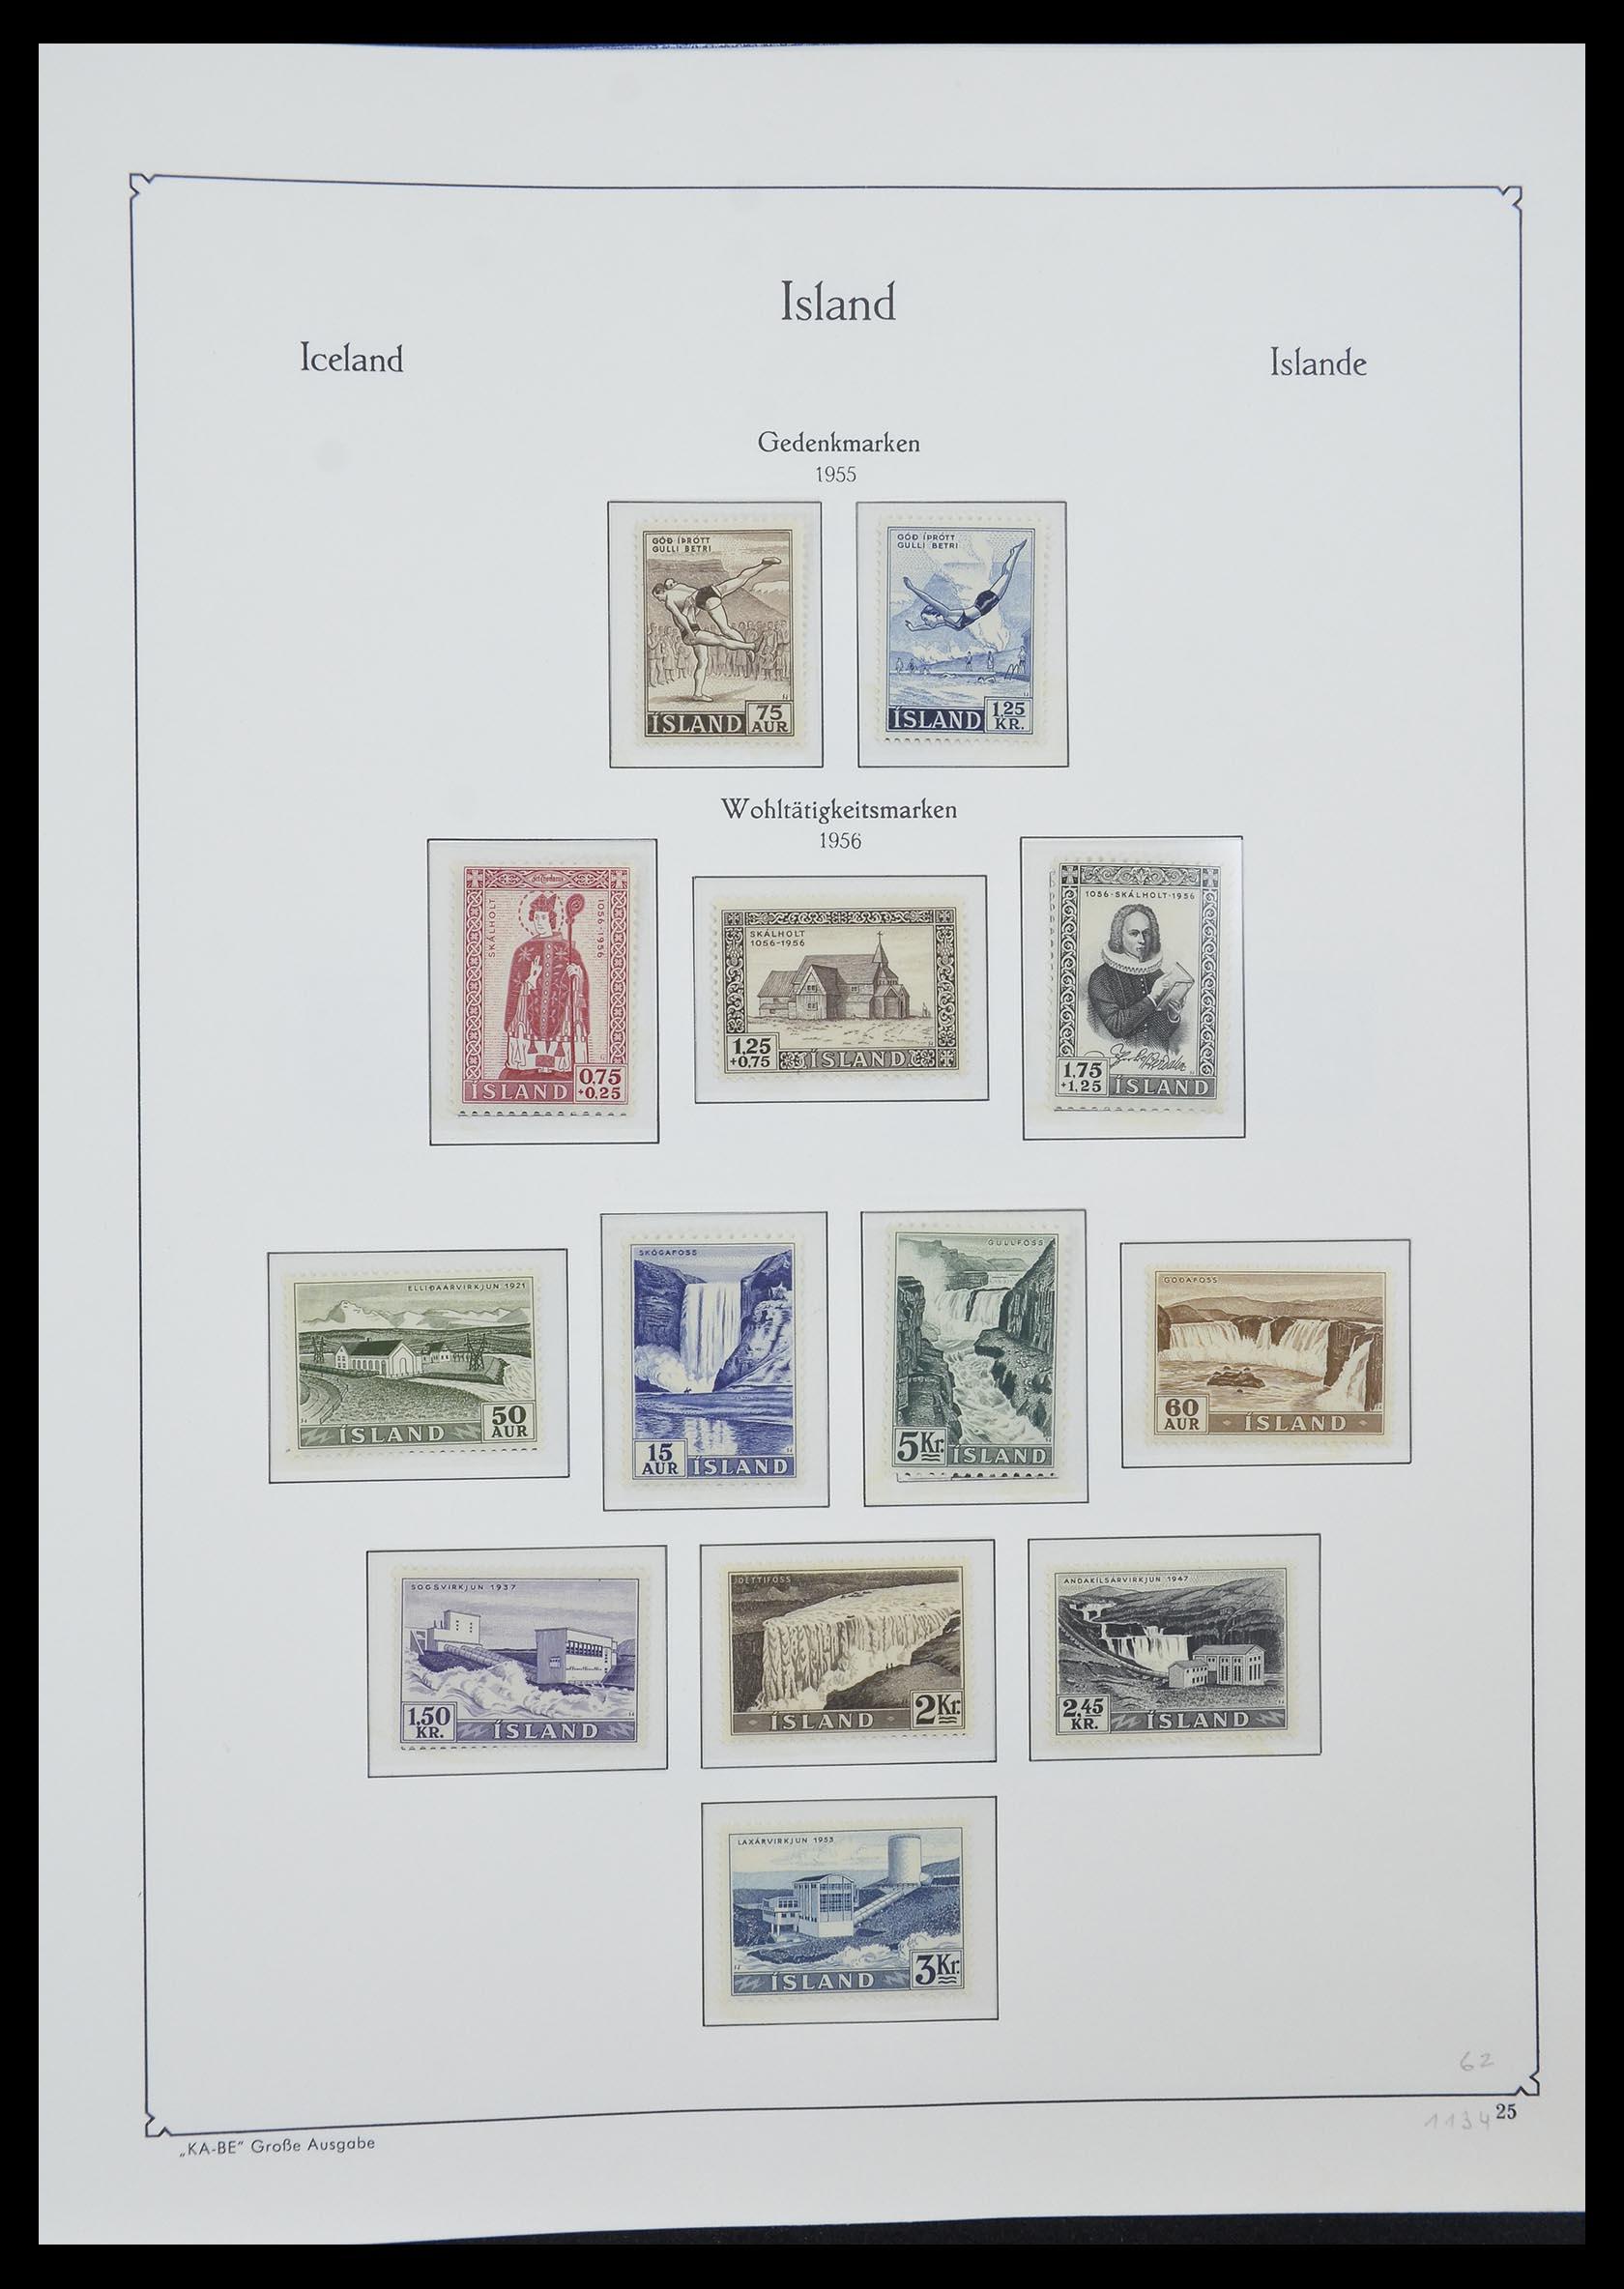 33185 008 - Postzegelverzameling 33184 Finland 1856-1990.